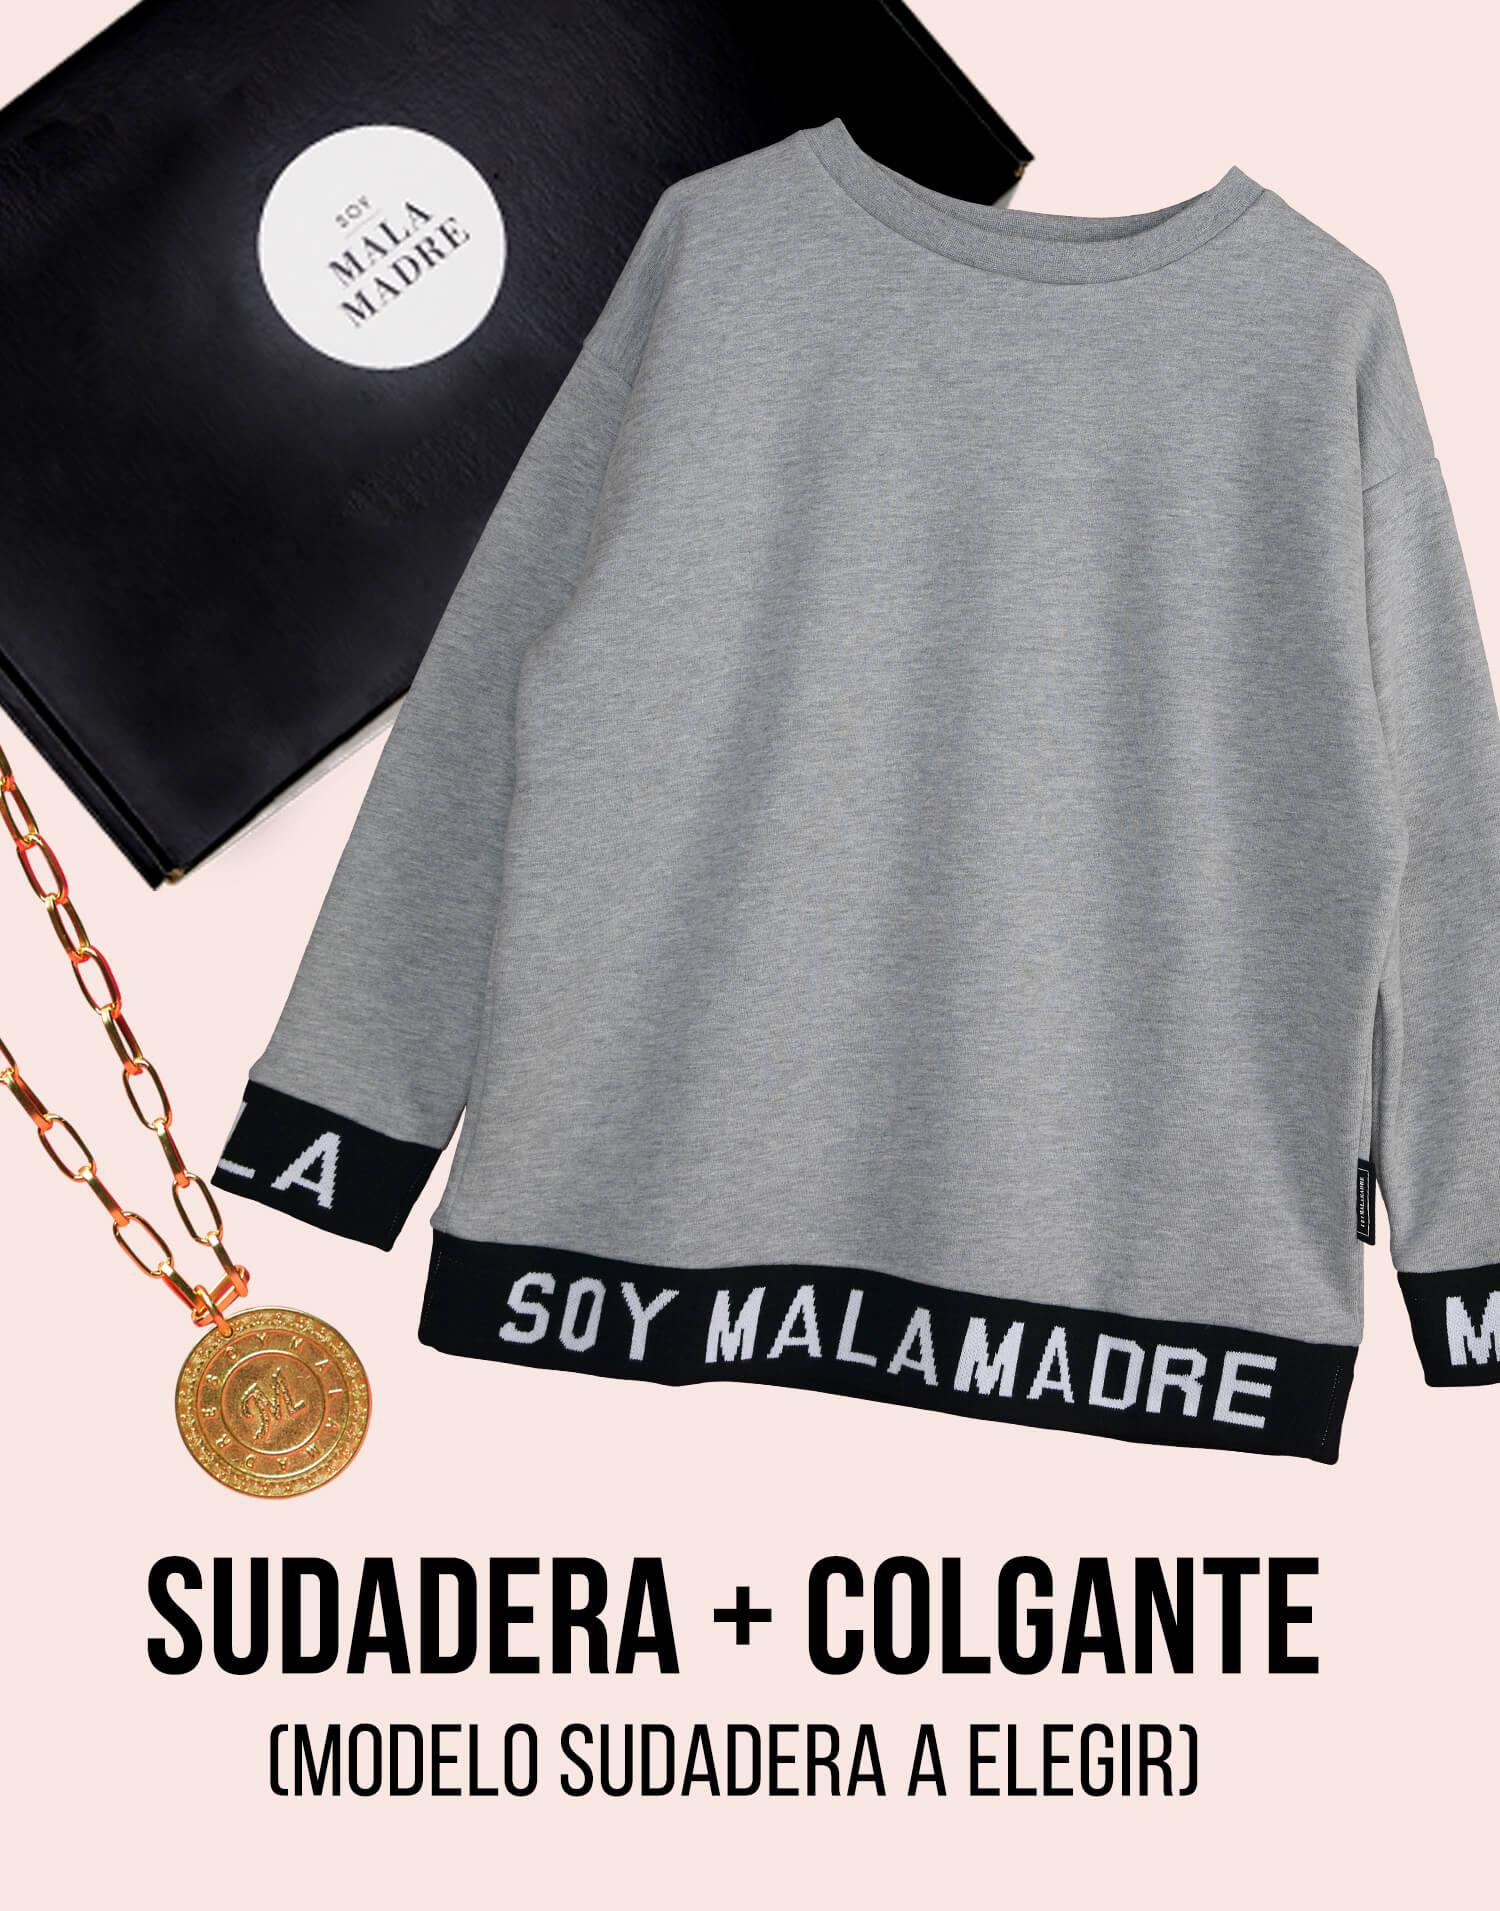 Kit  sudadera con colgante medalla 'Soy Malamadre'